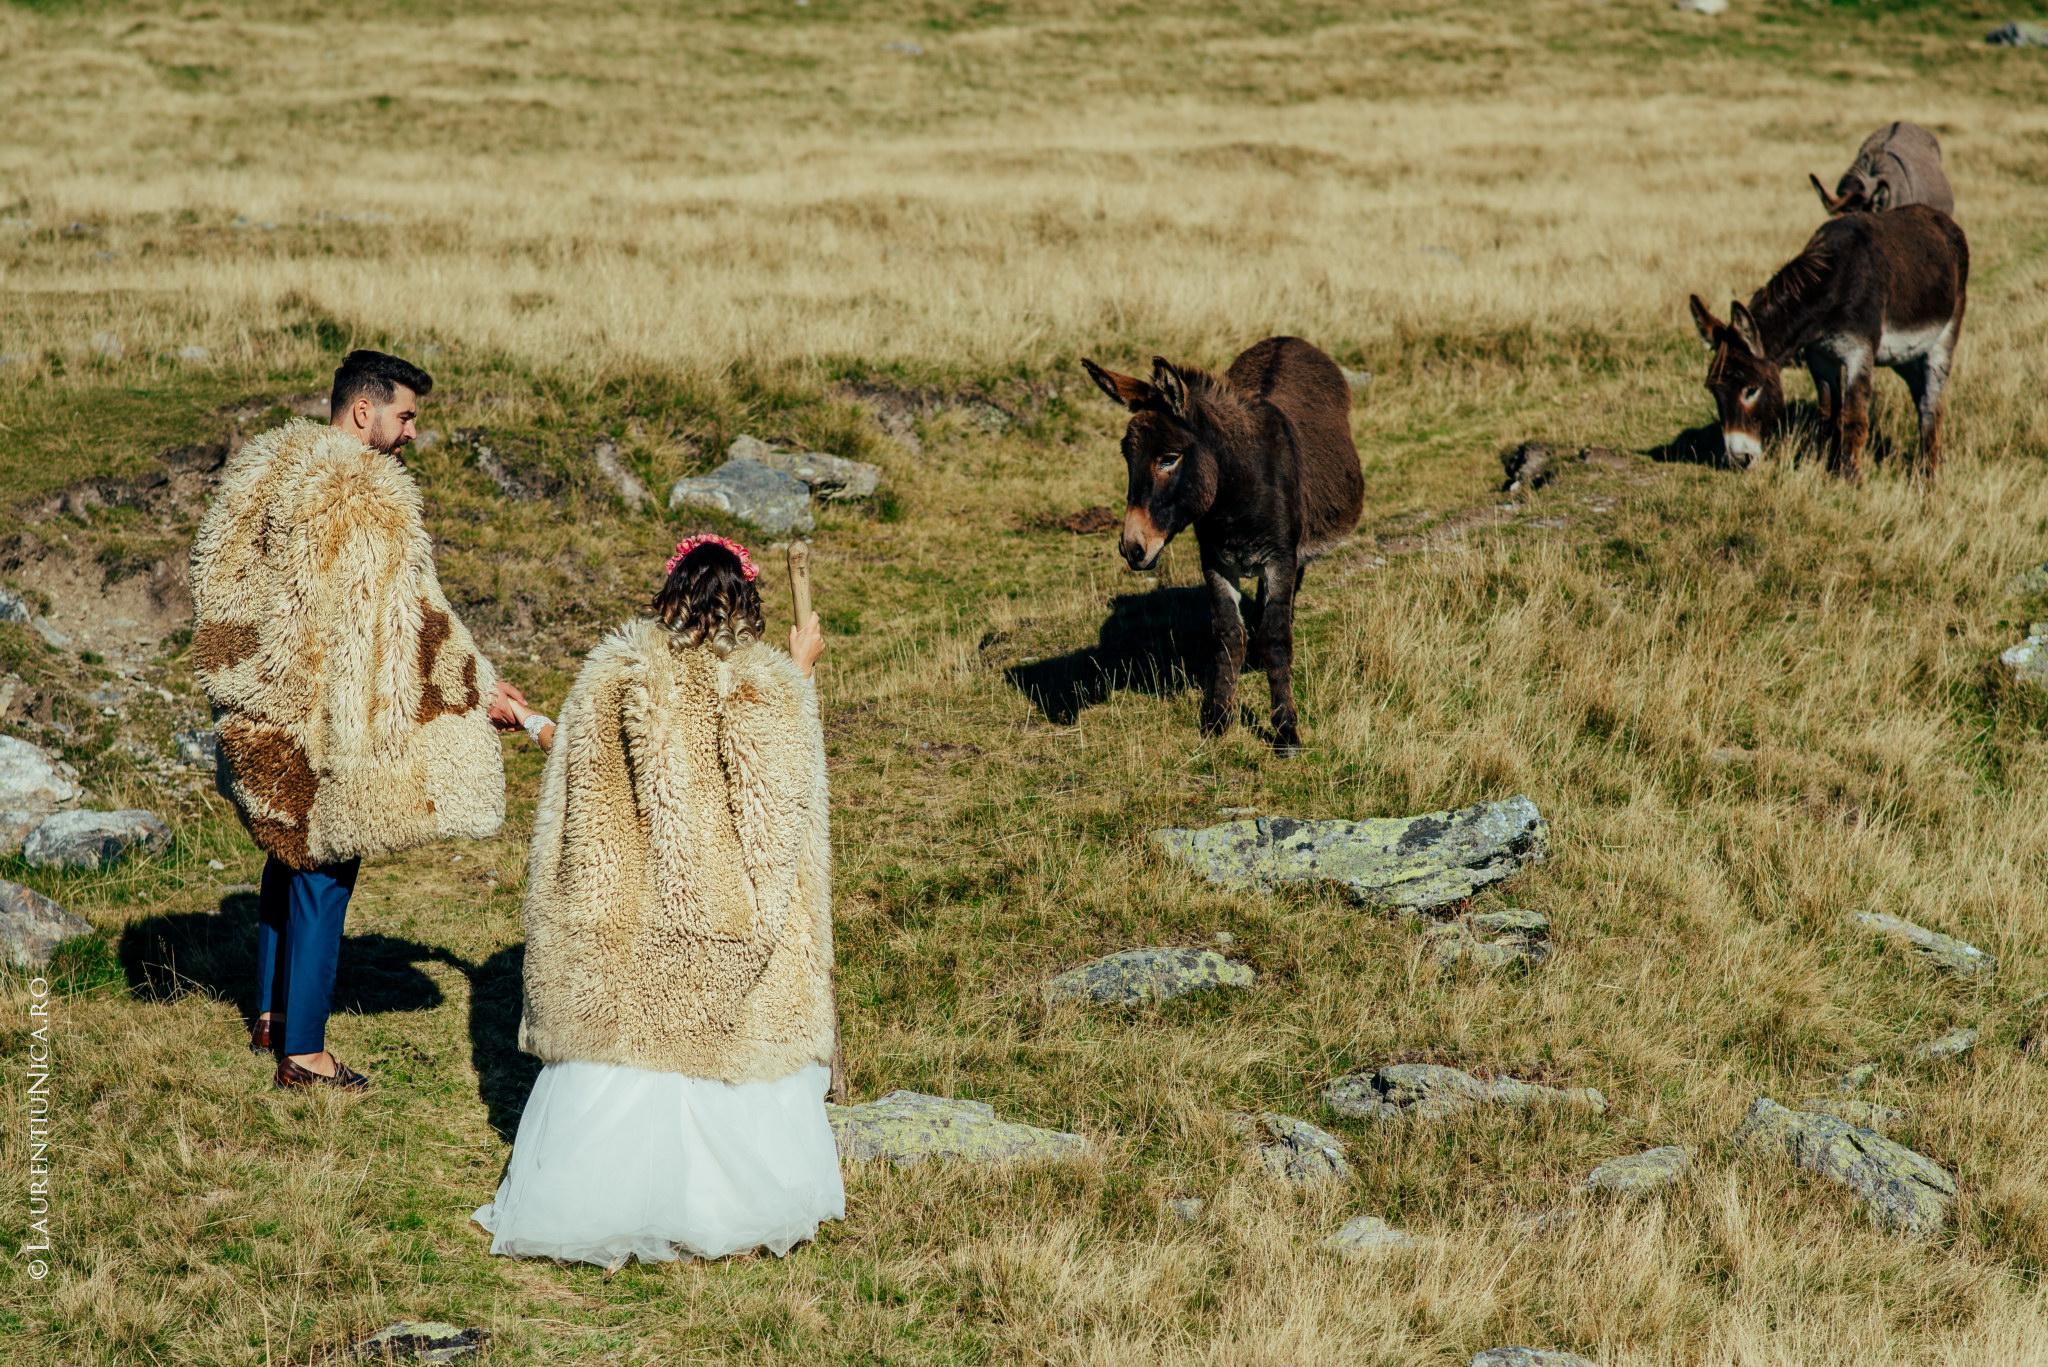 aida si alin fotograf nunta laurentiu nica transalpina 04 - Aida & Alin | Fotografii After Wedding | Transalpina - Muntii Parang